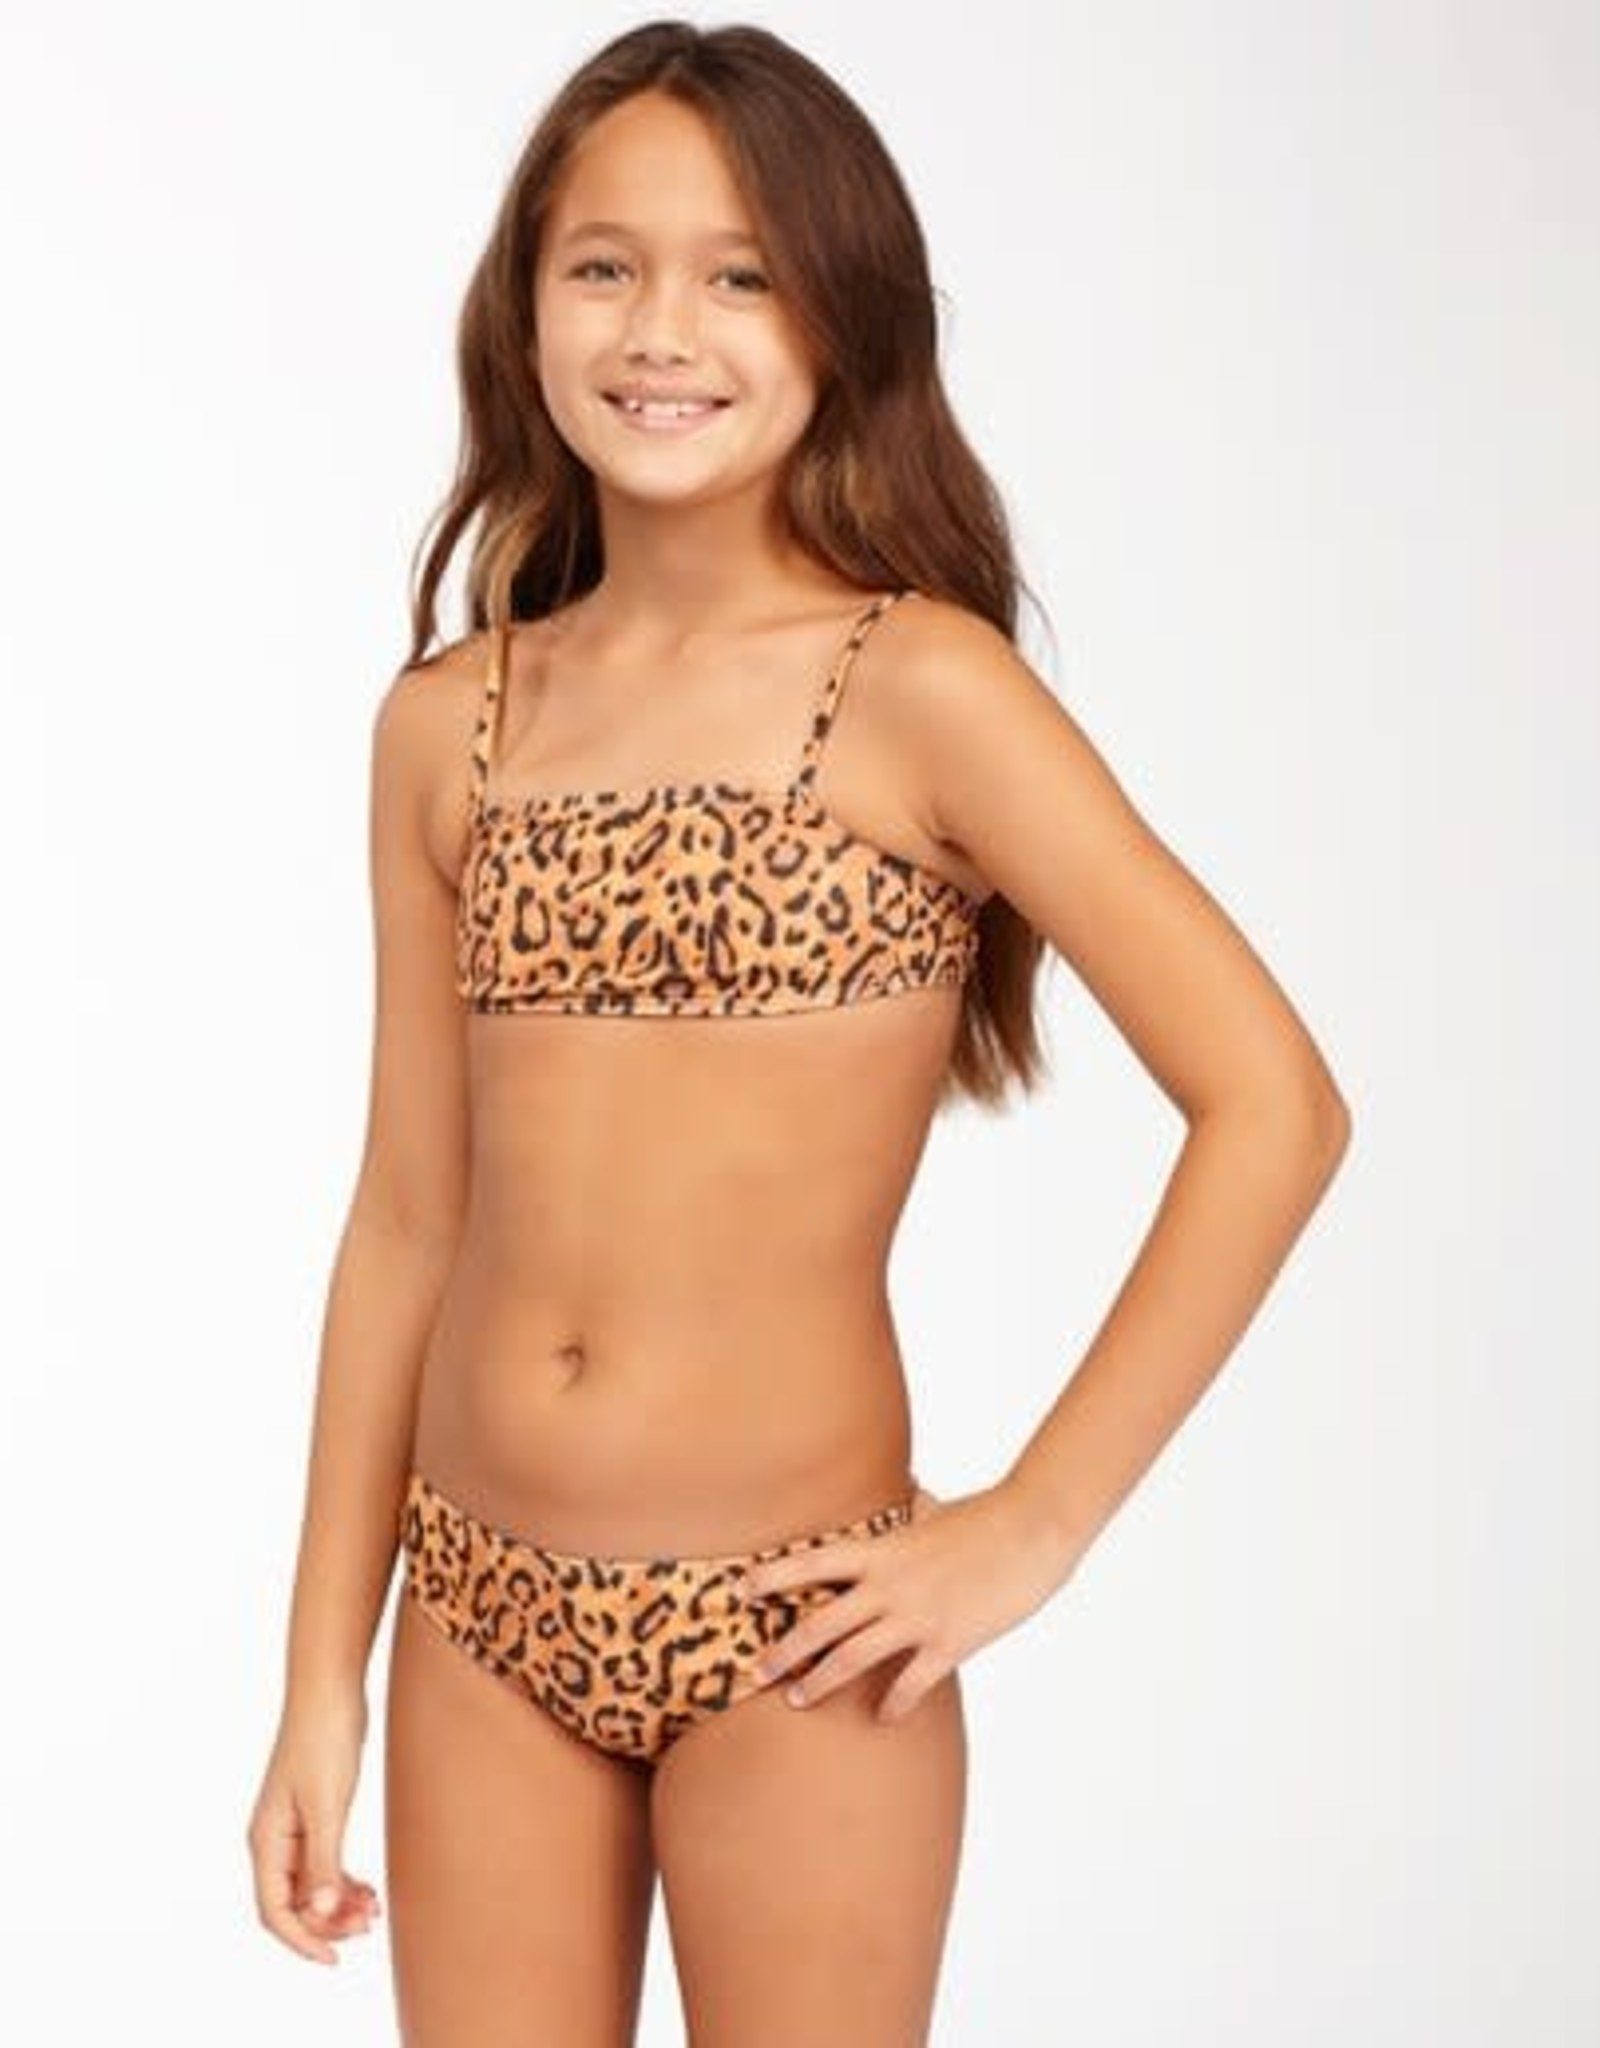 billabong Billabong Lil Bit Wild Bikini Set ABGX200168